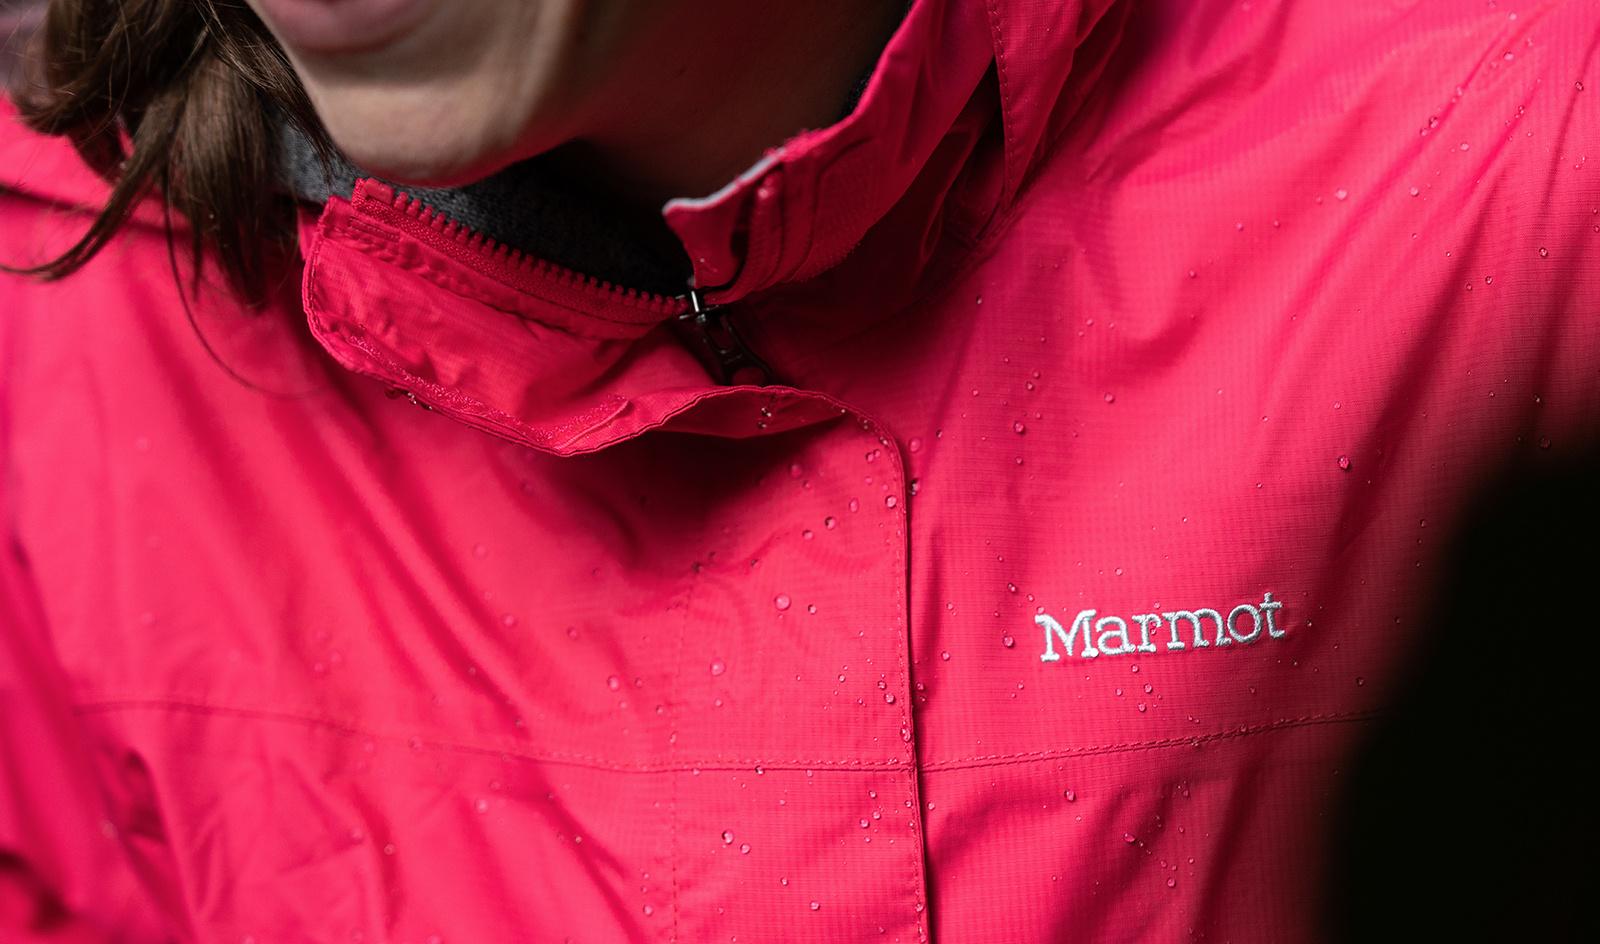 7779394db Marmot - Outdoor Clothing & Gear